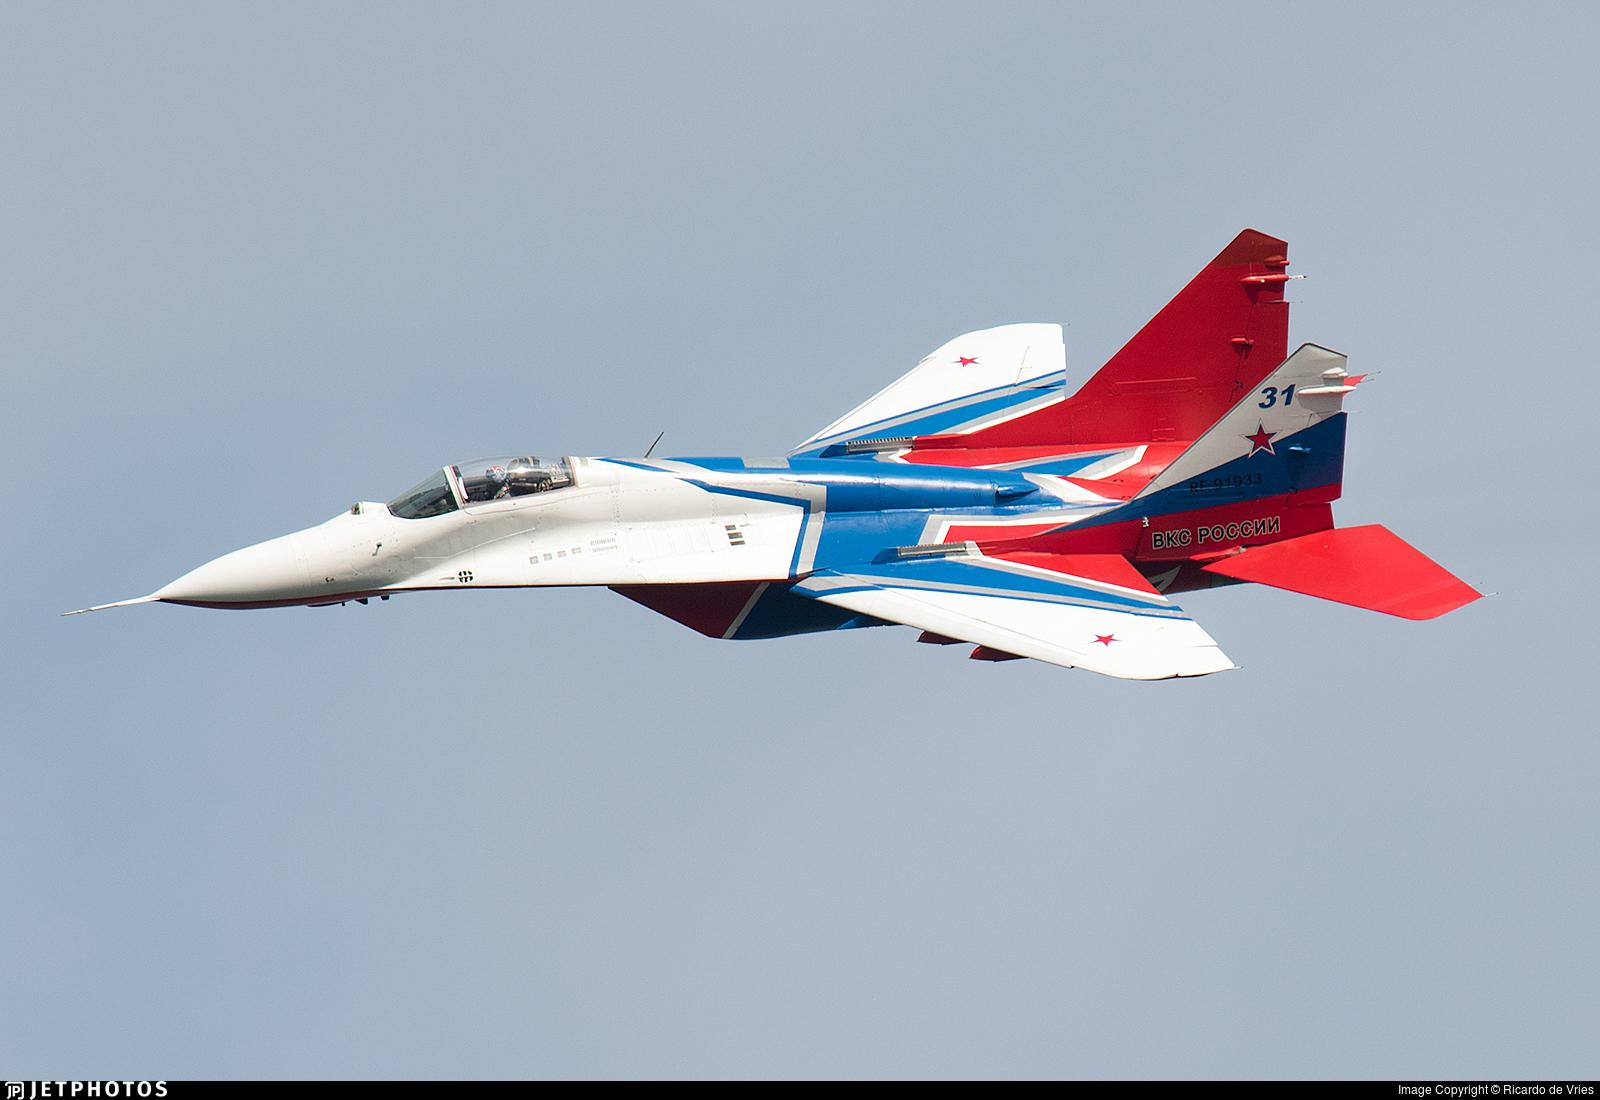 RF-91933 - Mikoyan-Gurevich MiG-29S Fulcrum C - Russia - Air Force